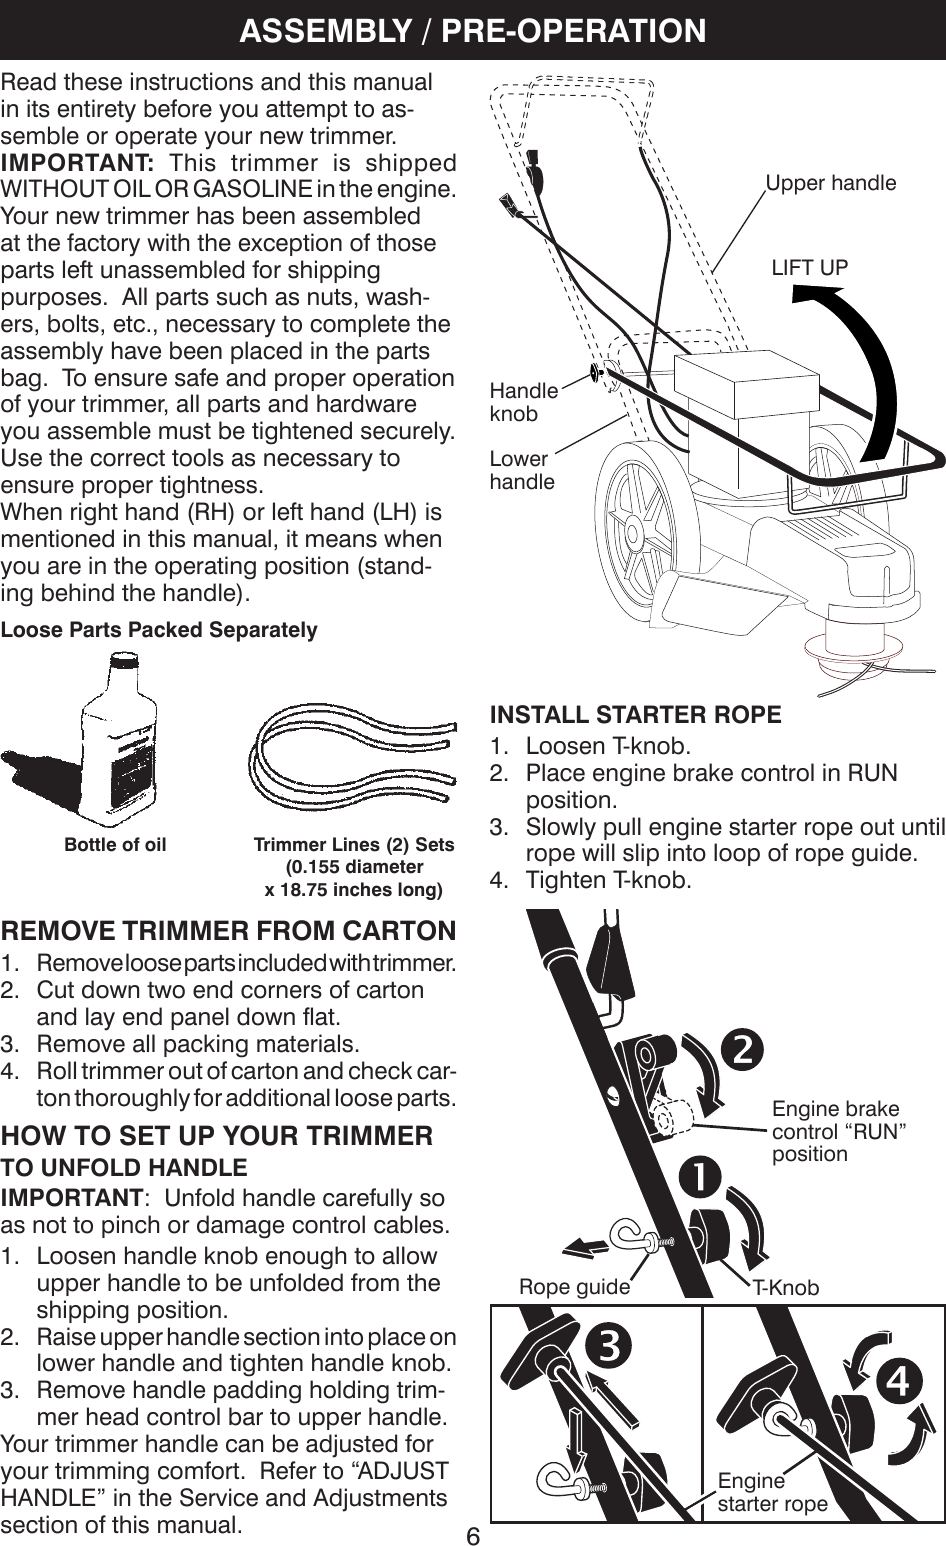 Craftsman 917776741 776741 es 579764302_r3 User Manual